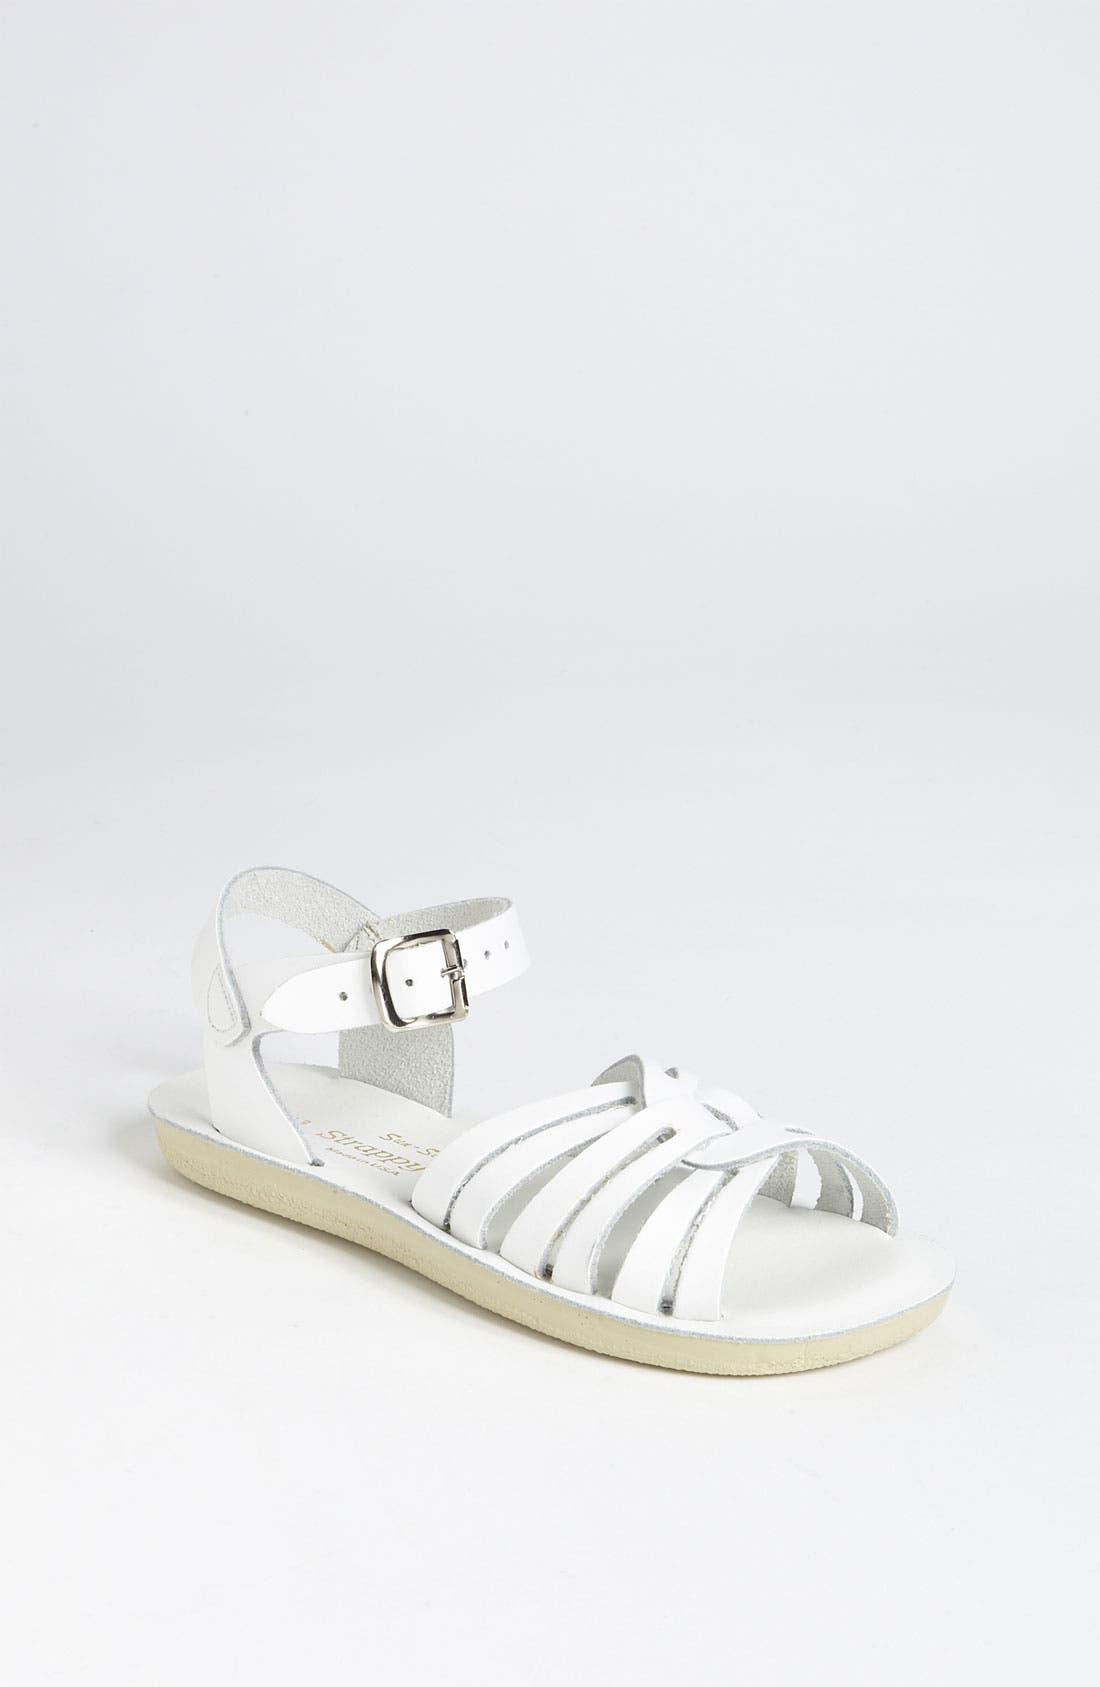 Main Image - Salt Water Sandals by Hoy Strappy Sandal (Walker, Toddler & Little Kid)